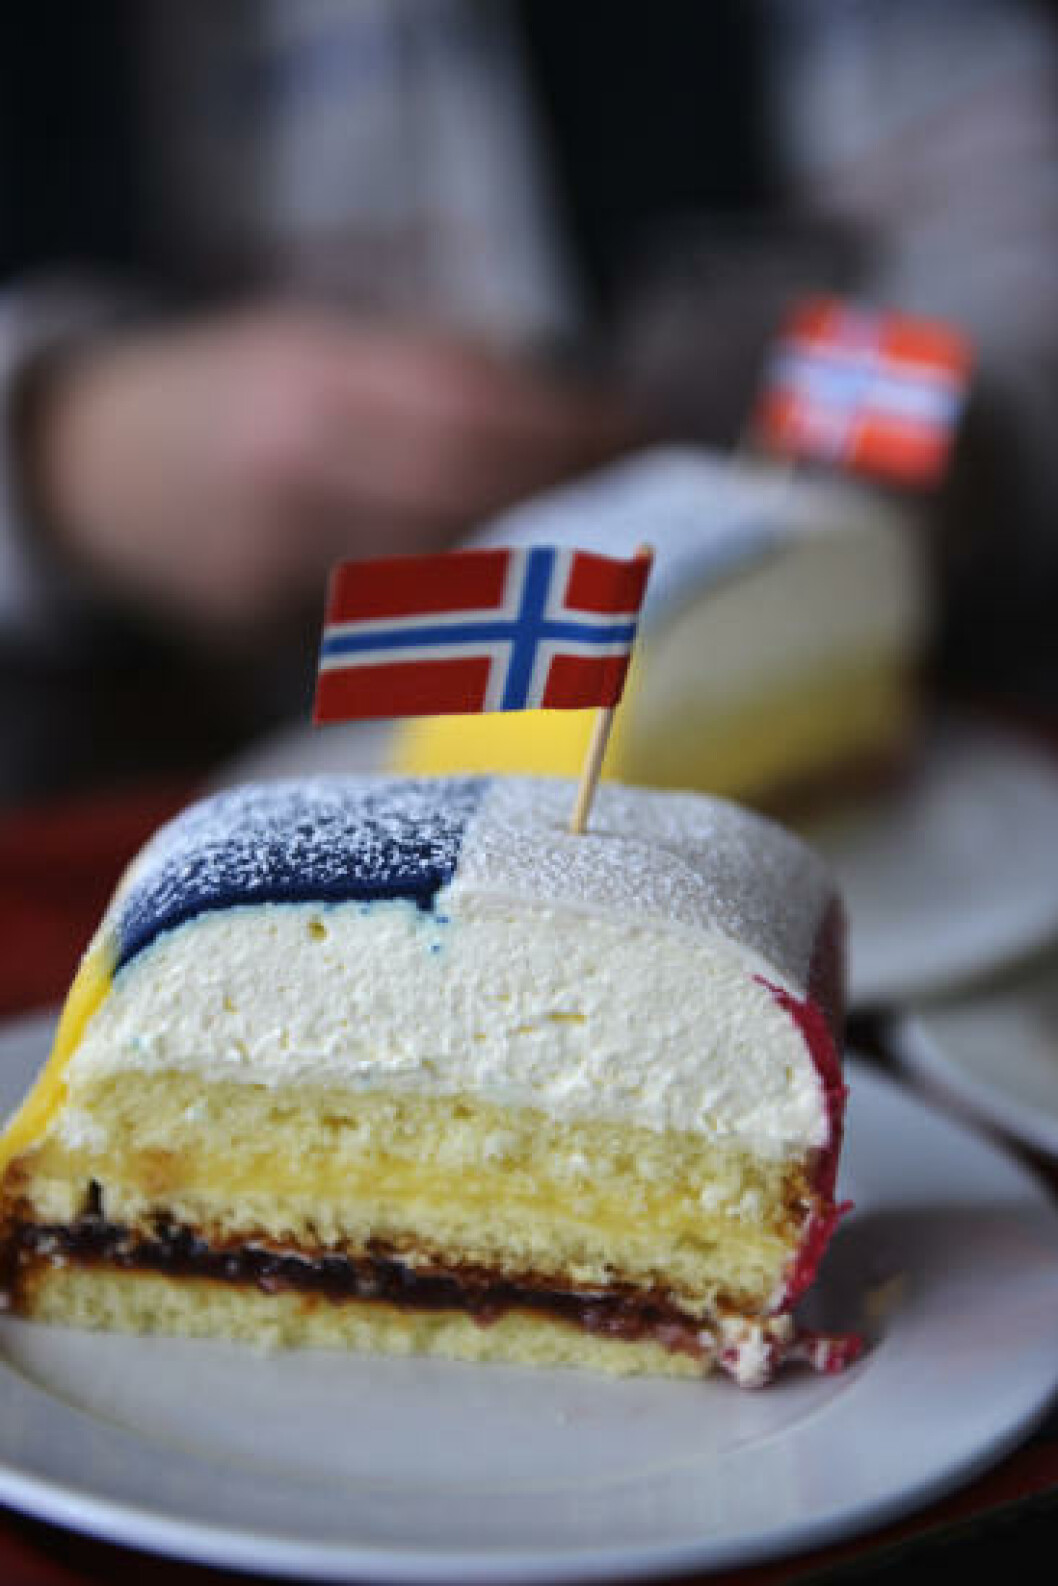 <strong>HURRA FOR NORGE:</strong> På Fricks Konditori i Rättvik har de laget sin egen norgestårta - med en egen forbrødringstvist på flaggfargene. Foto: GJERMUND GLESNES